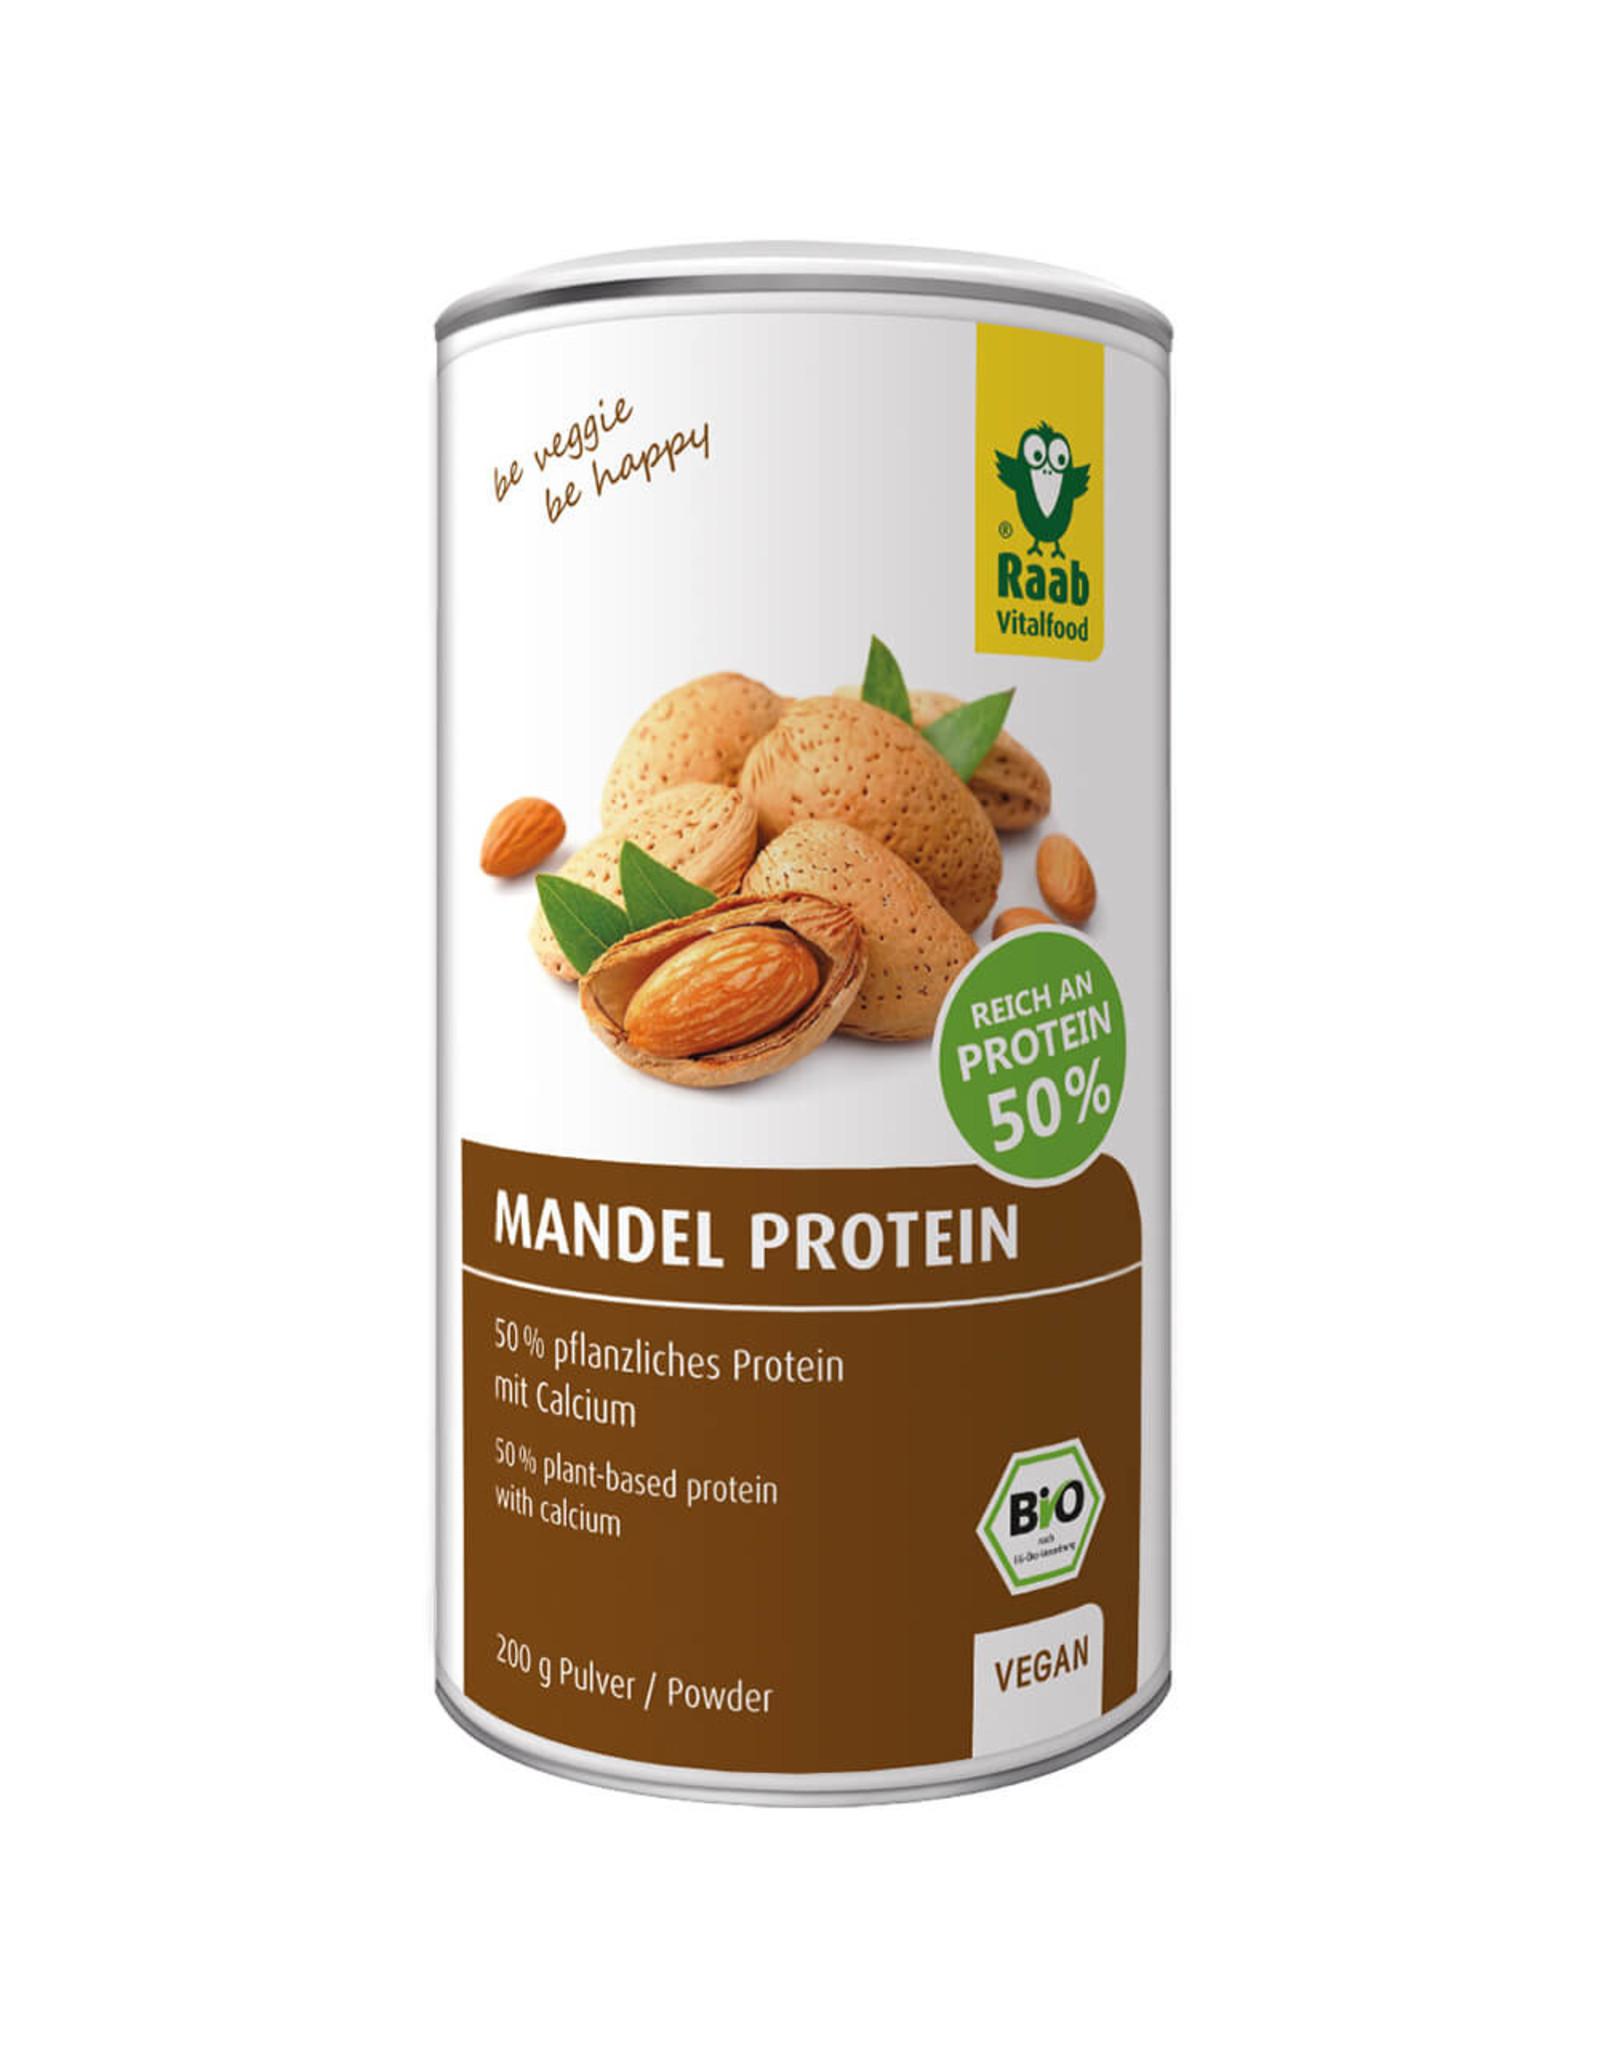 Raab Vitalfood Mandel-Protein Pulver 200g